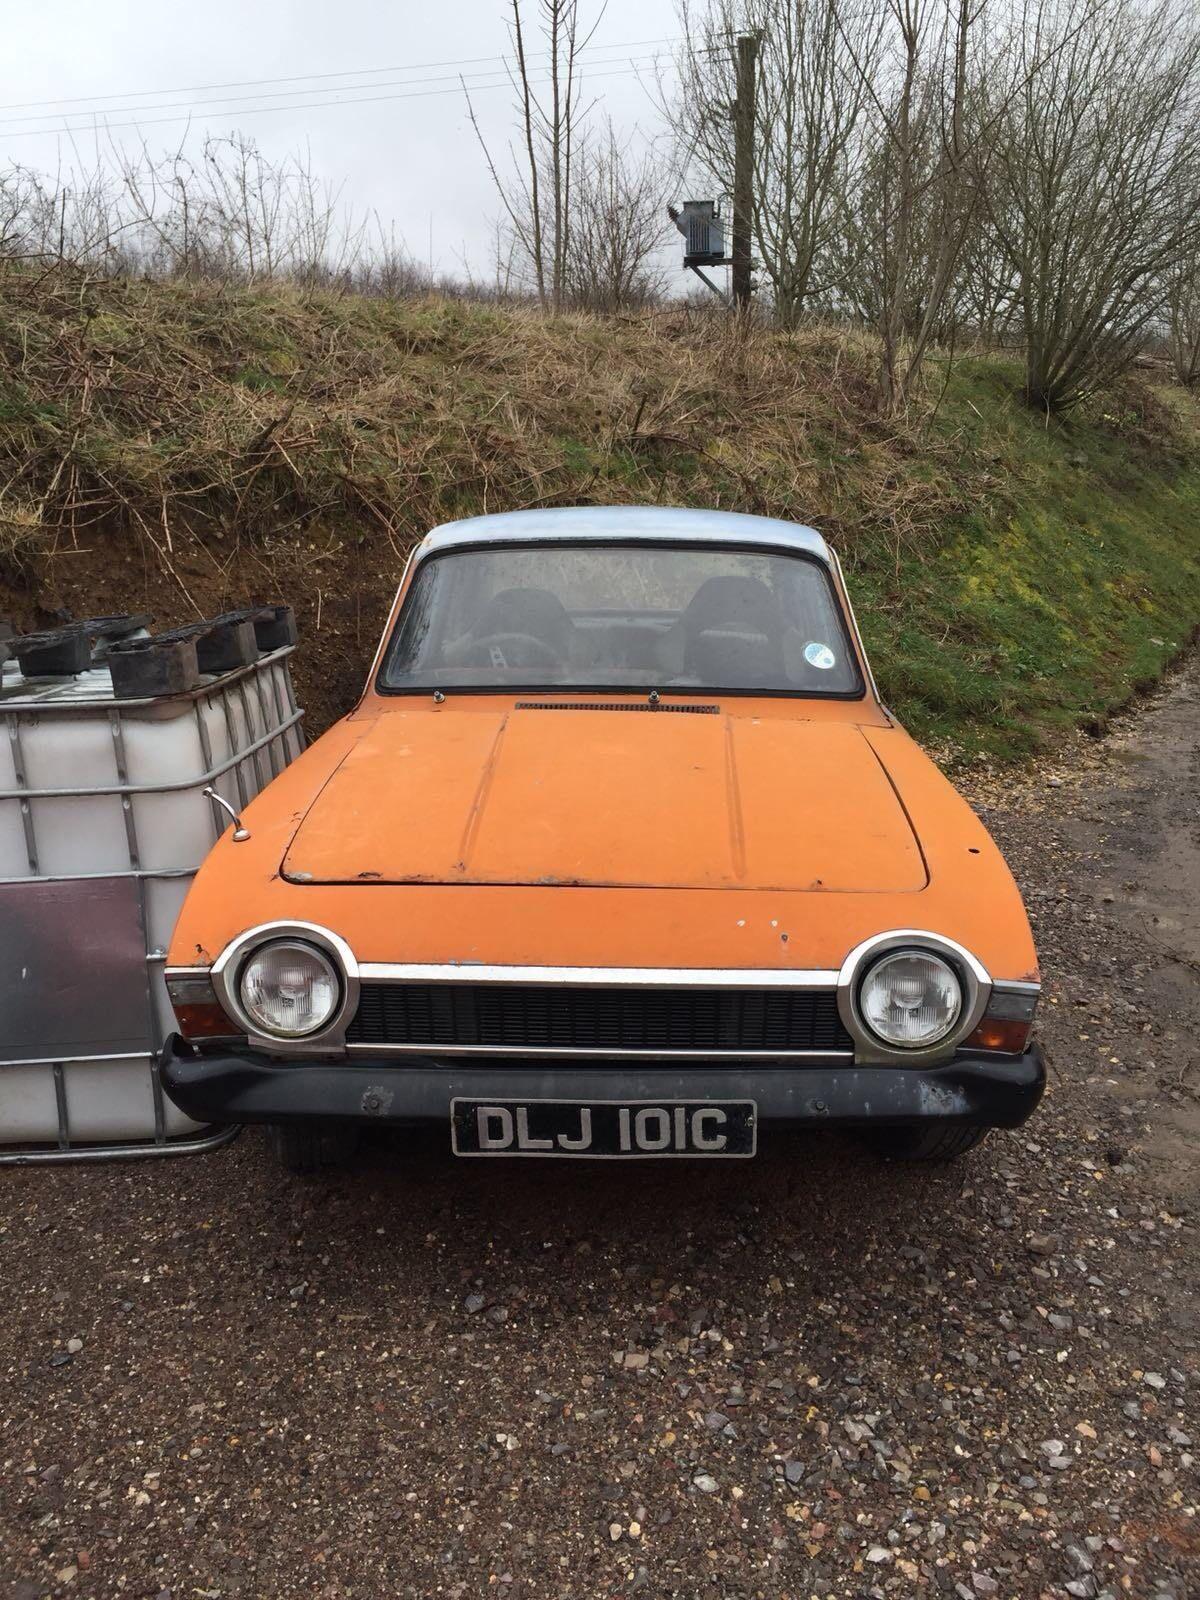 Ford Corsair V Rat Project Barn Find Drift Car Classic Car UK - Classic car projects